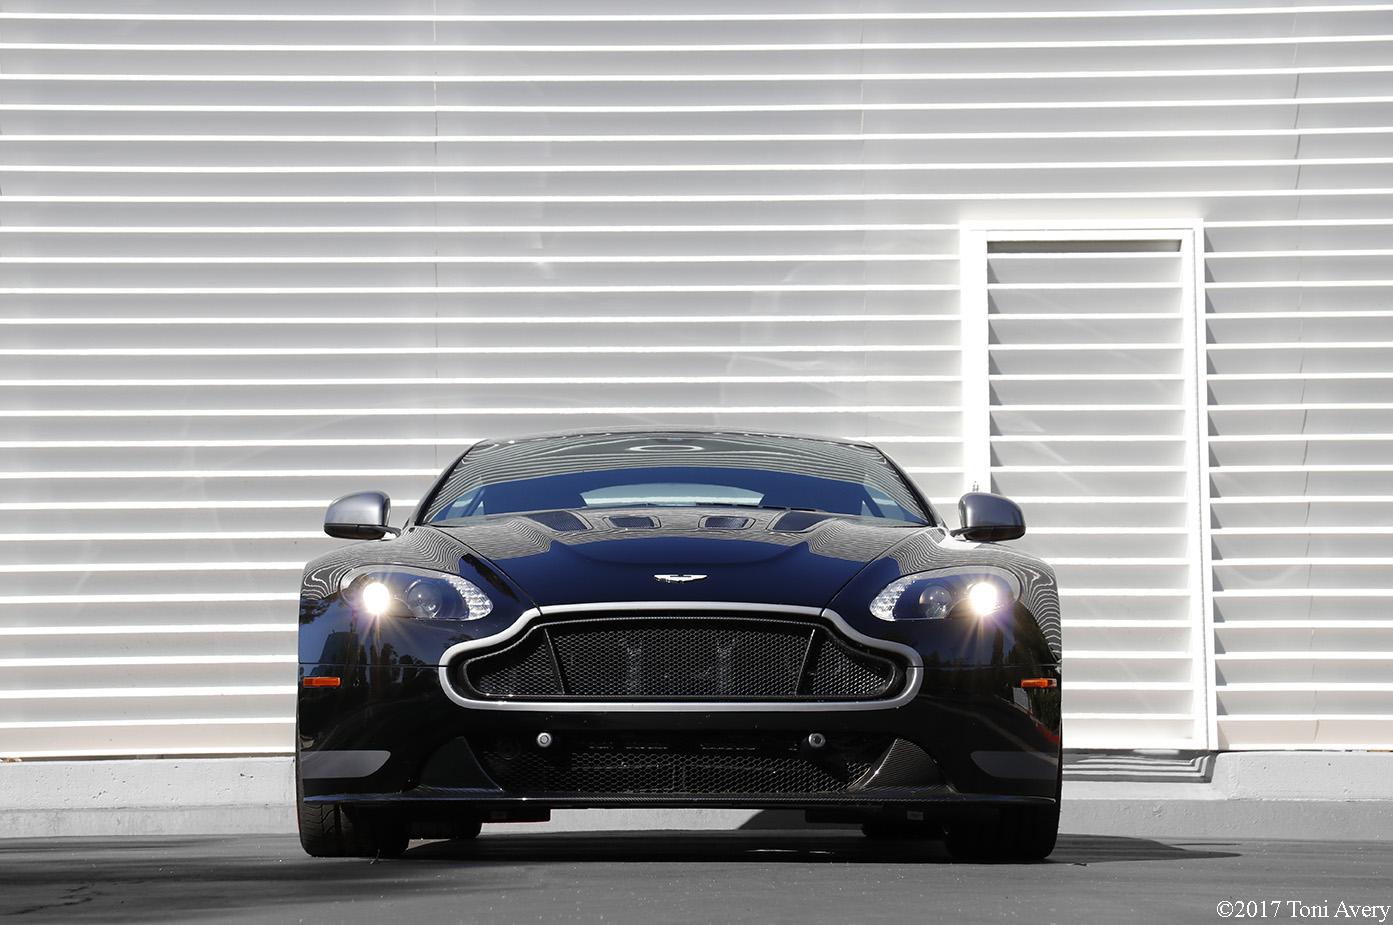 2017 Aston Martin V12 Vantage S Review